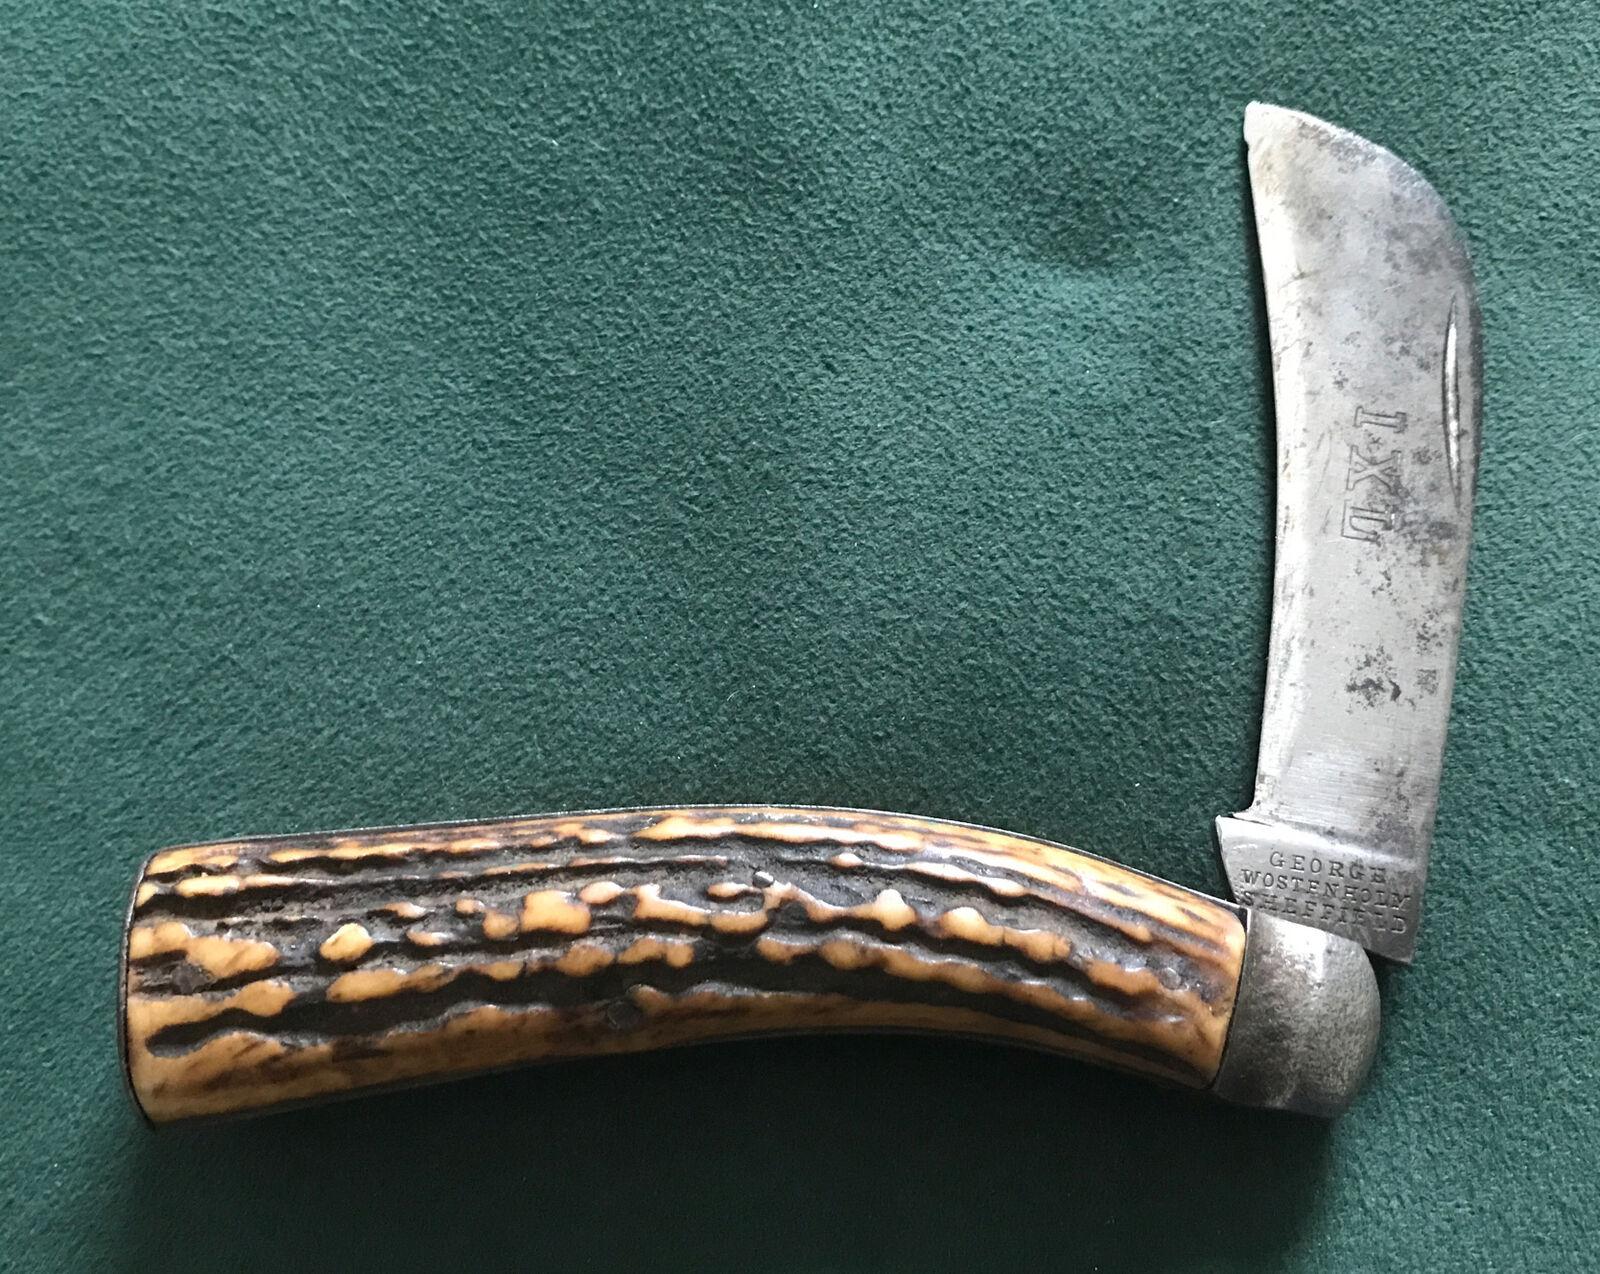 ANTIQUE IXL GEORGE WOSTENHOLM ENGLAND HAWKBILL STAG LARGE POCKET KNIFE RARE OS.